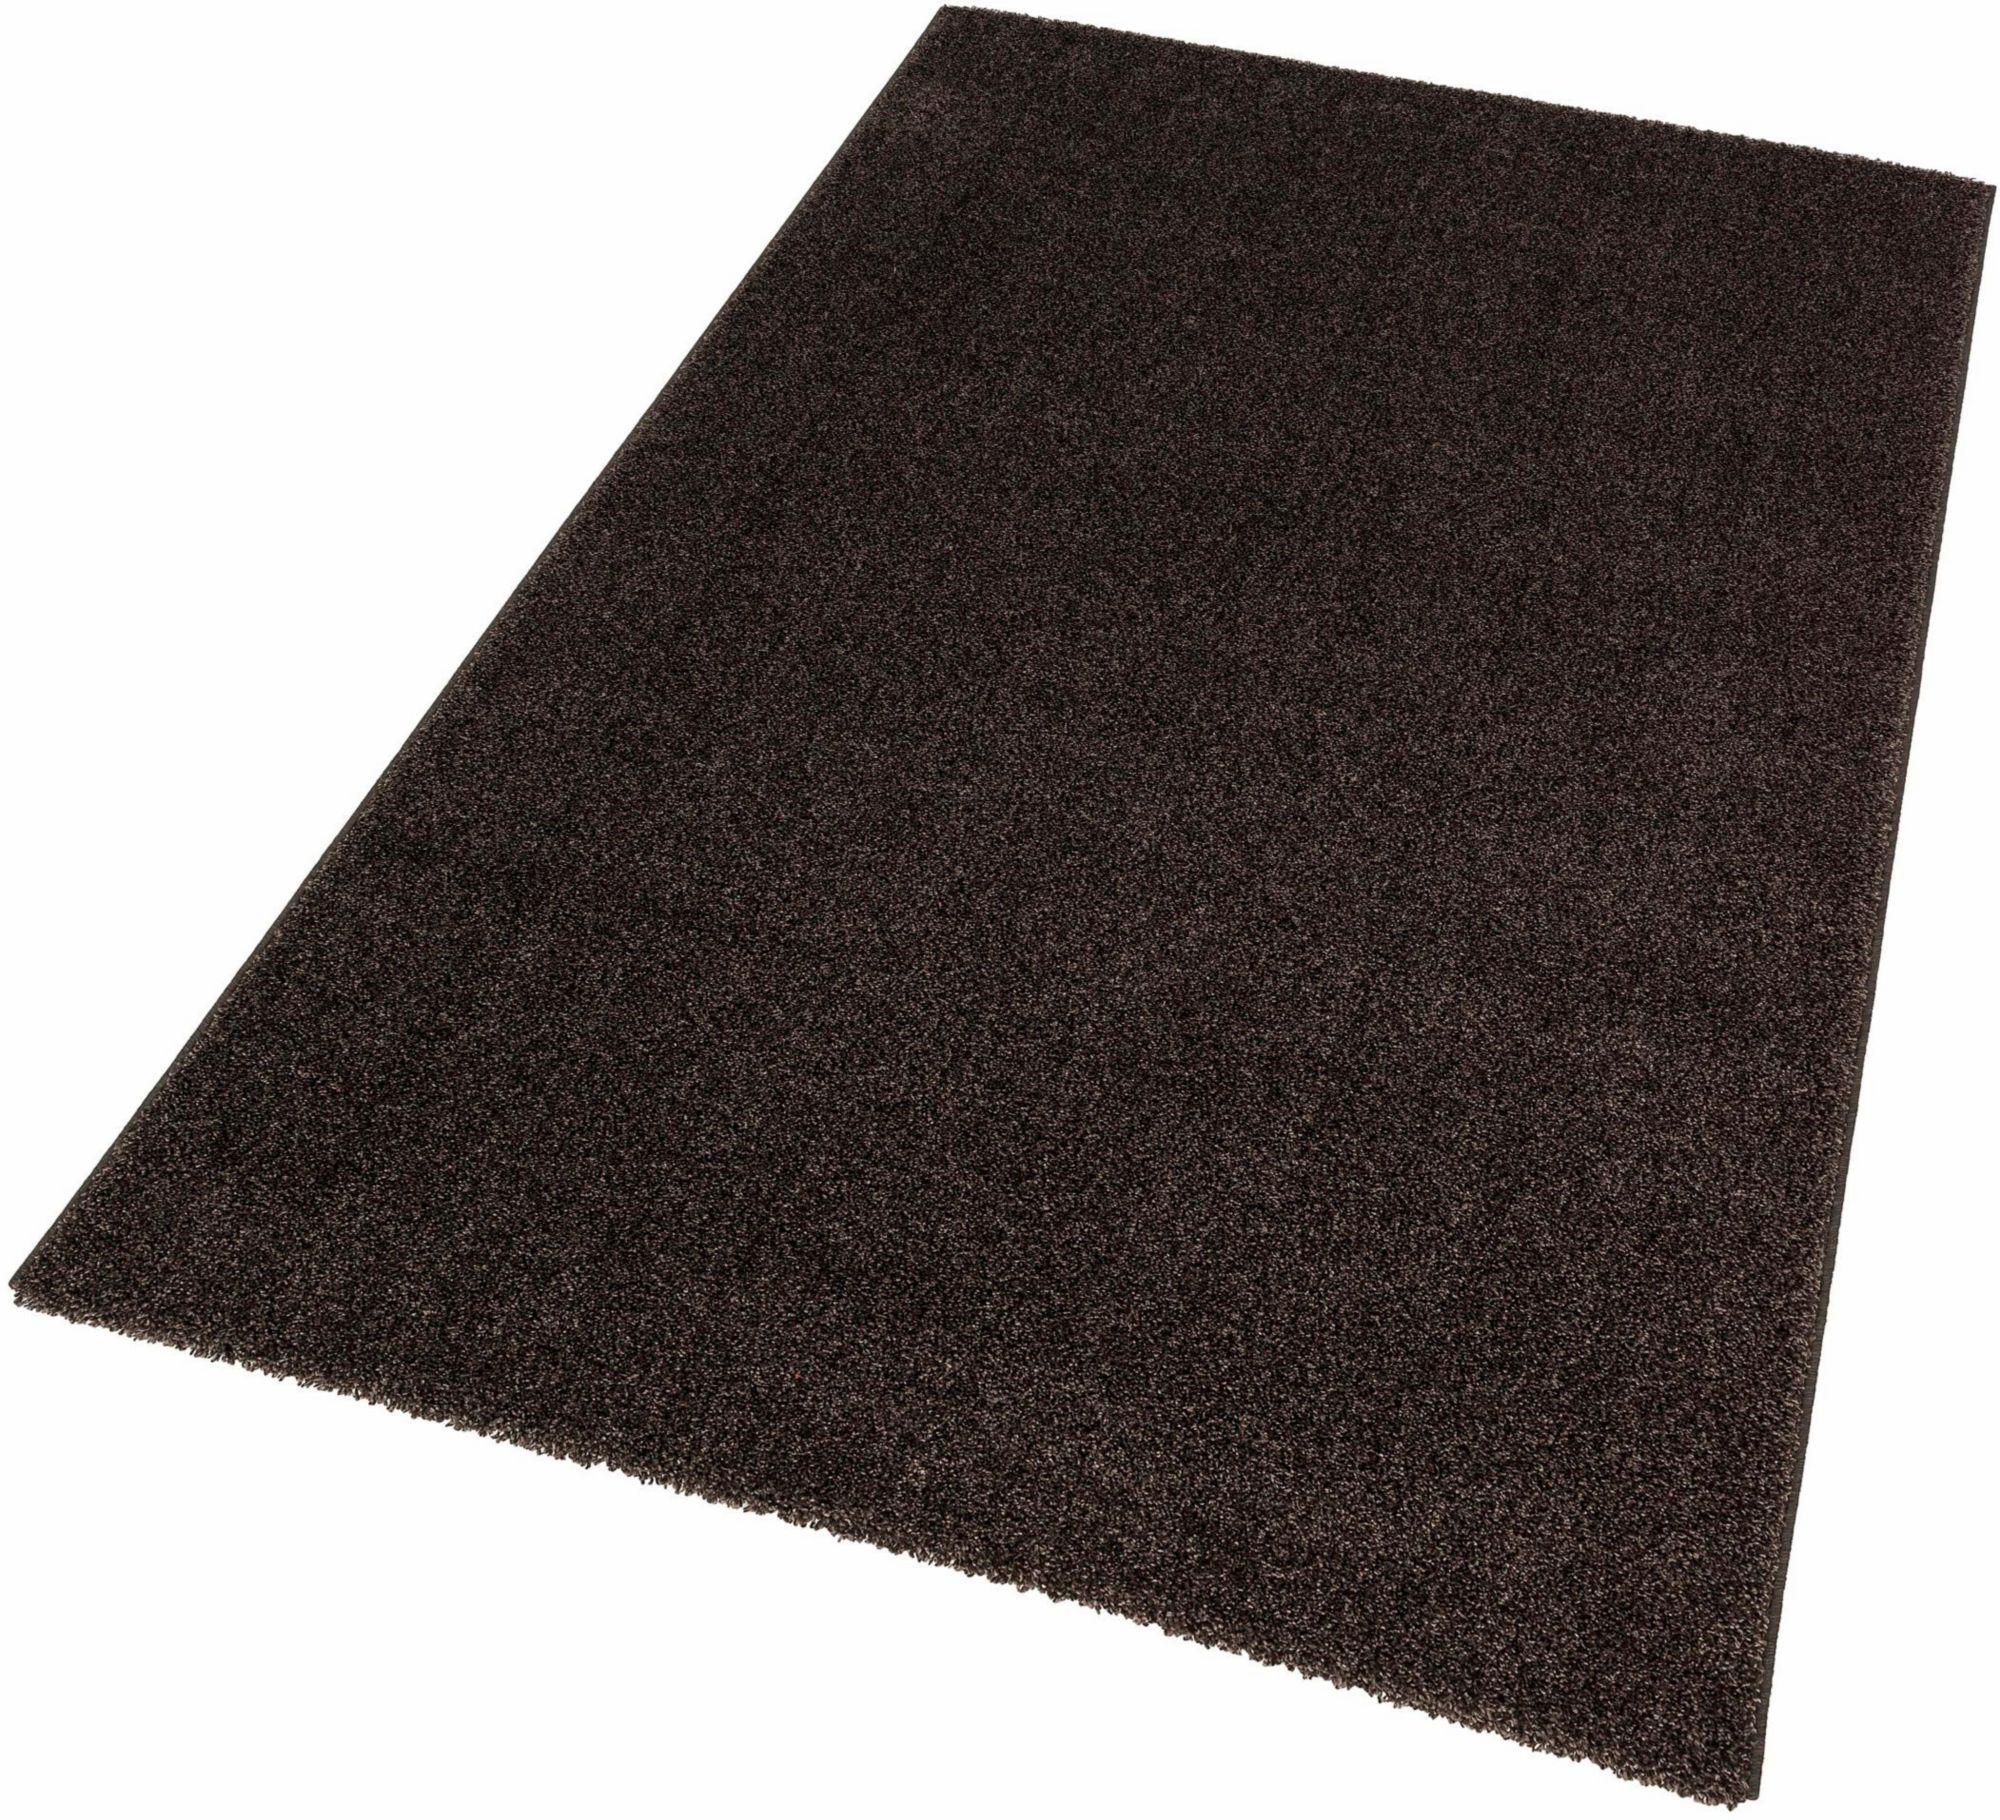 ASTRA Hochflor-Teppich, Astra, »Riva«, Höhe 25 mm, gewebt